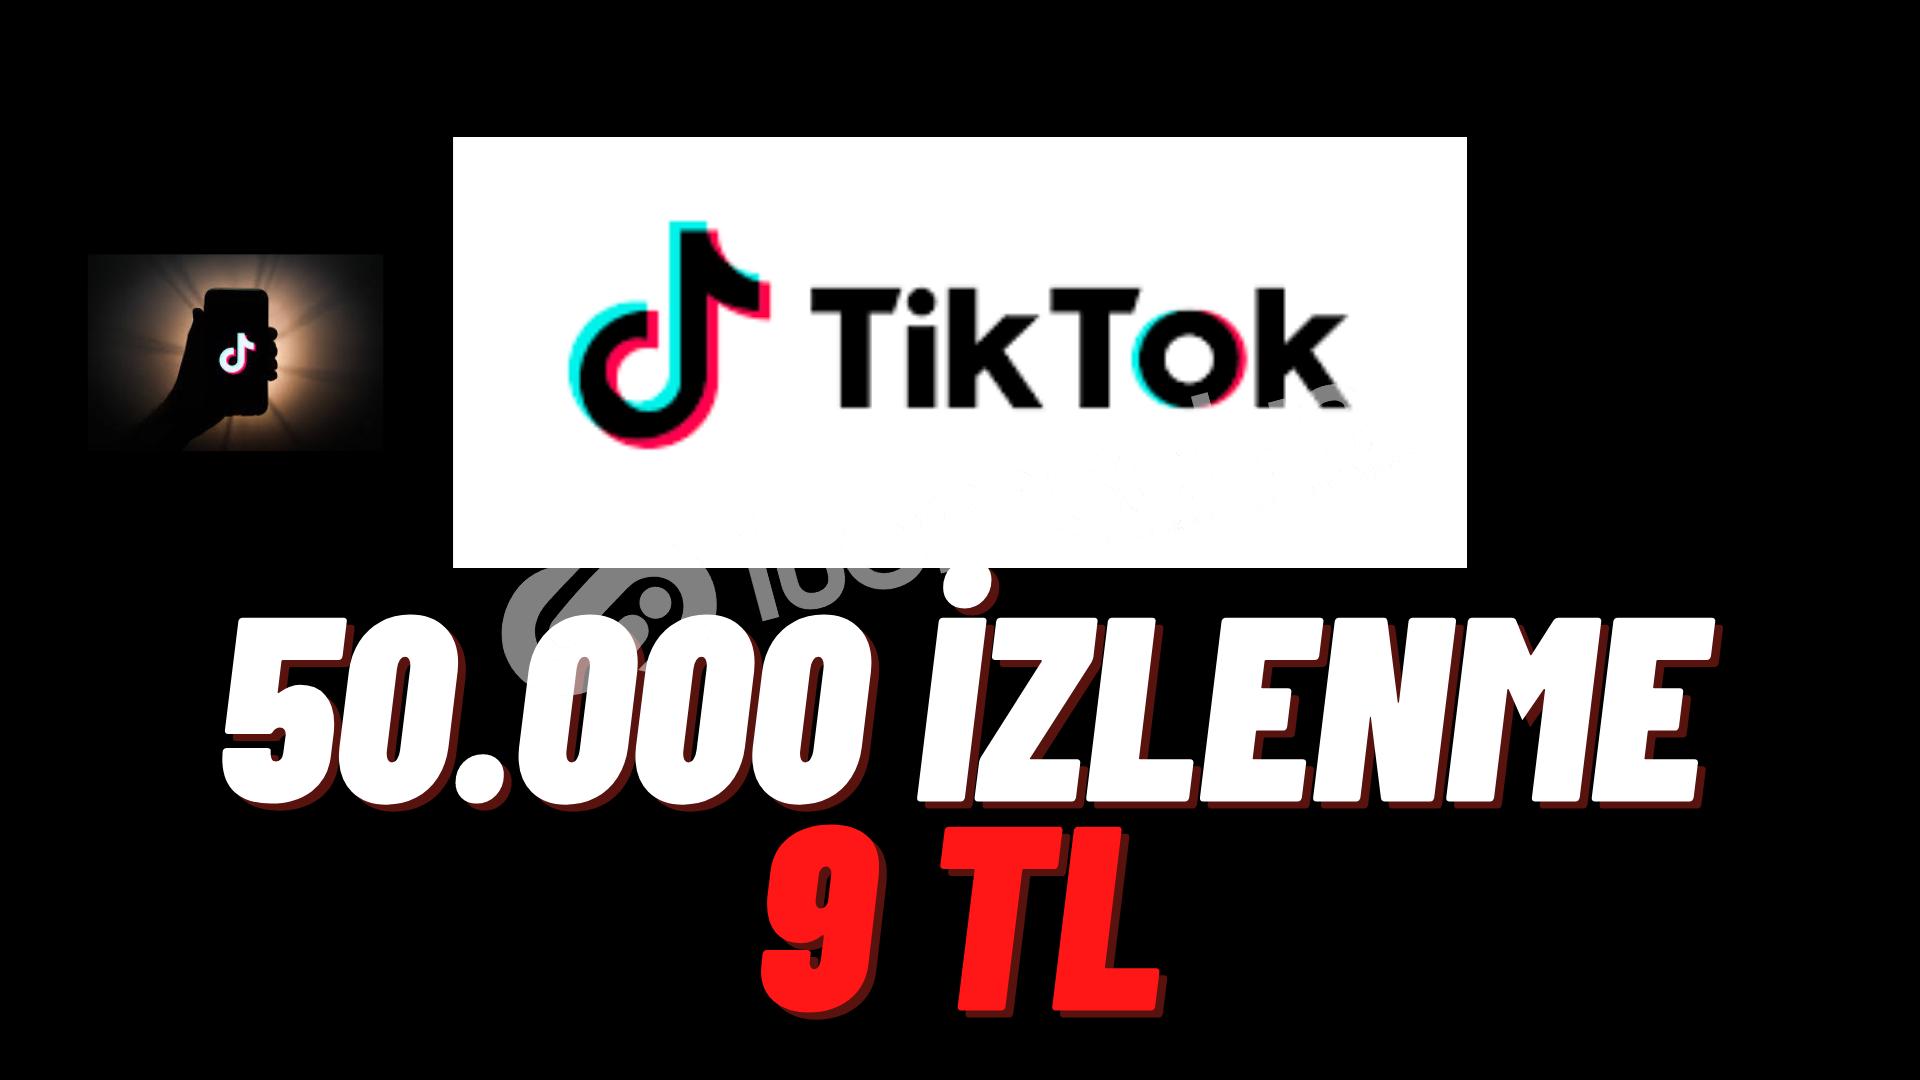 TİKTOK 50.000 İZLENME